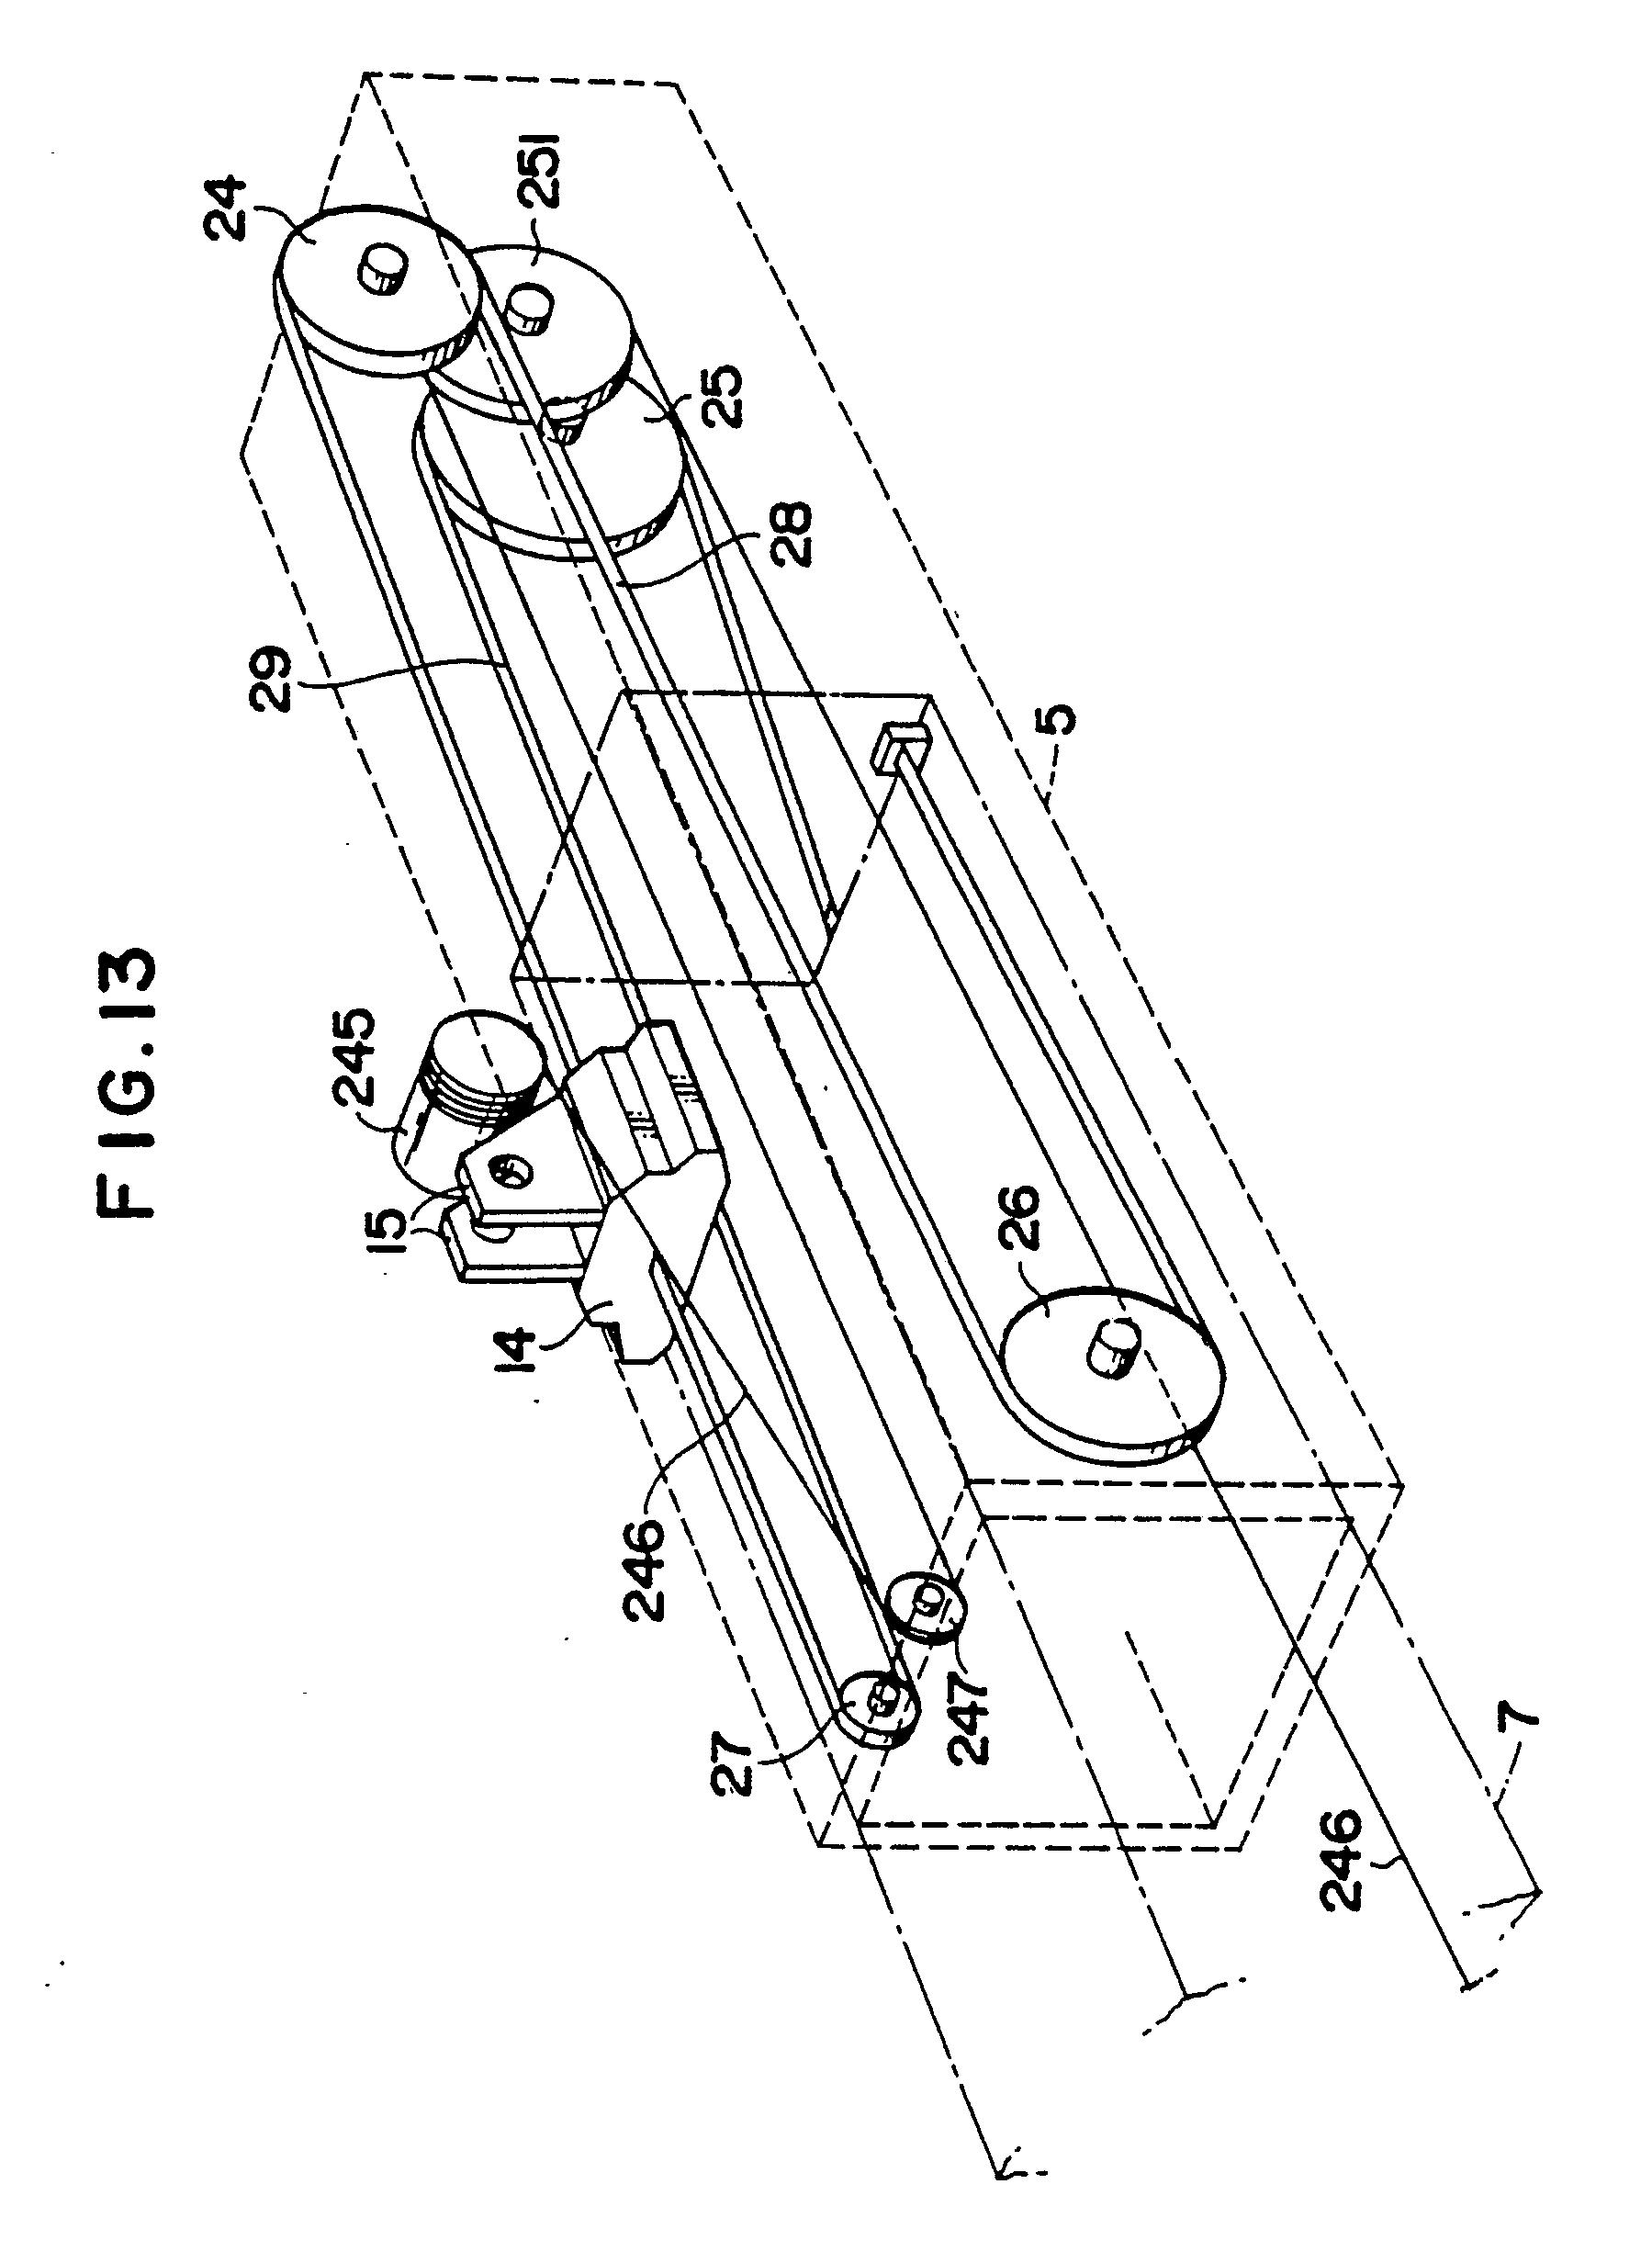 1995 kia sportage wiring diagram online wiring diagram Tractor Alternator Wiring Diagram 2004 volvo fuse box wiring diagram database2004 kium fuse box diagram wiring diagram database 1995 volvo